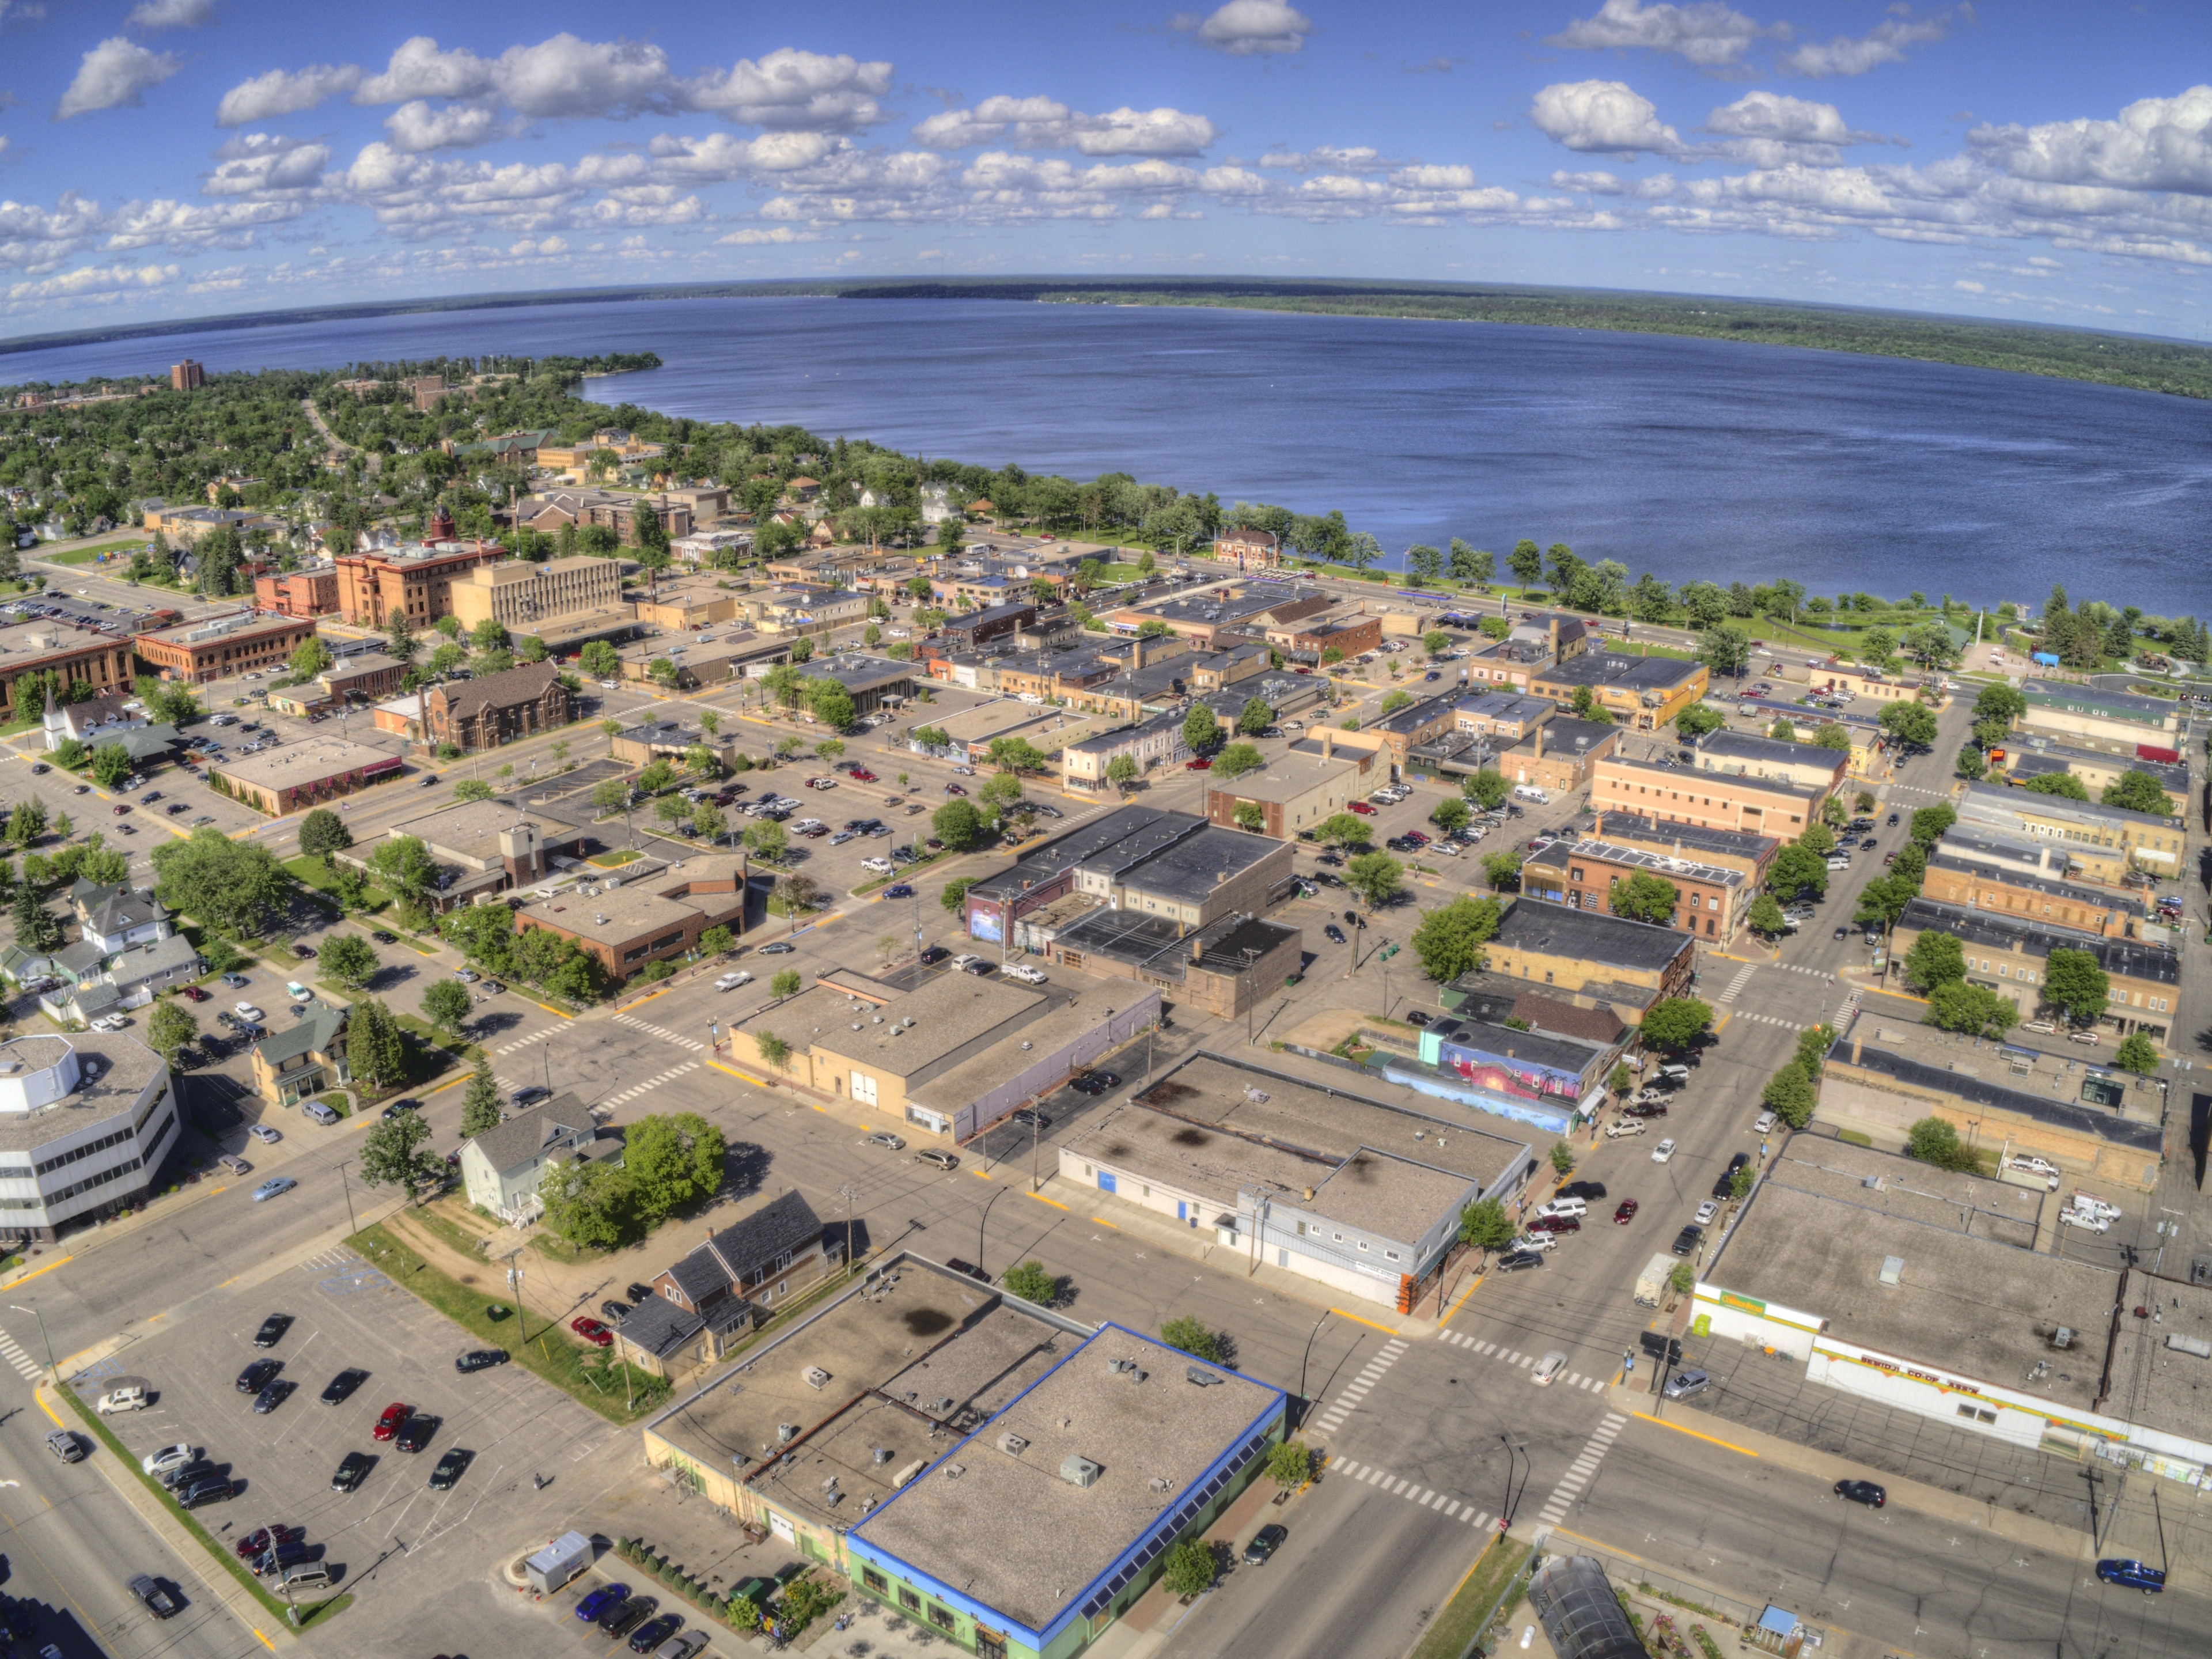 Bemidji, Minnesota, United States of America